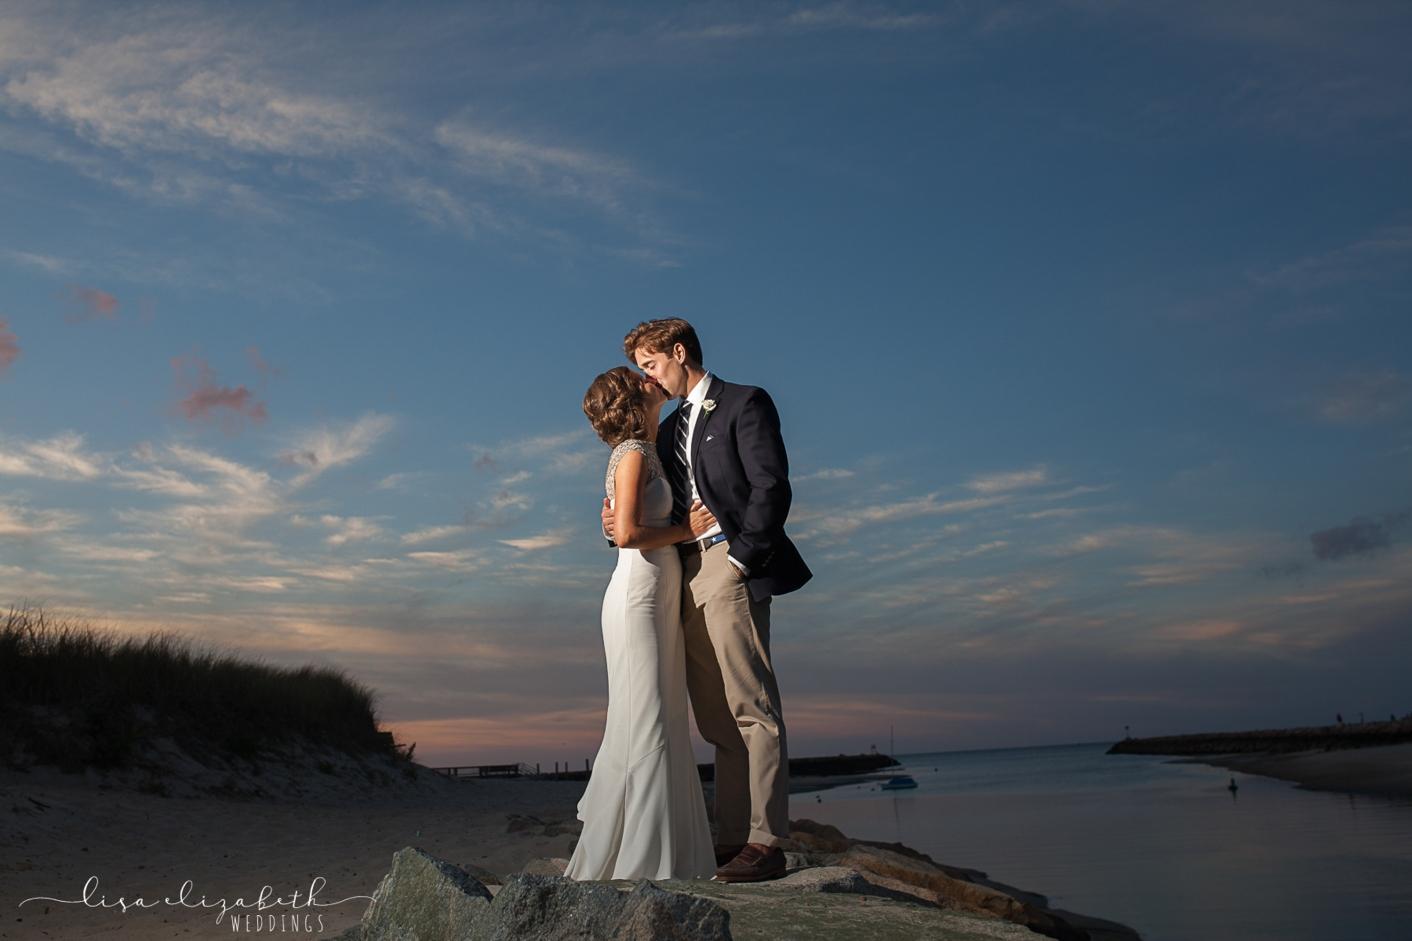 cape-cod-wedding-photographer-lisa-elizabeth-images-19-of-19